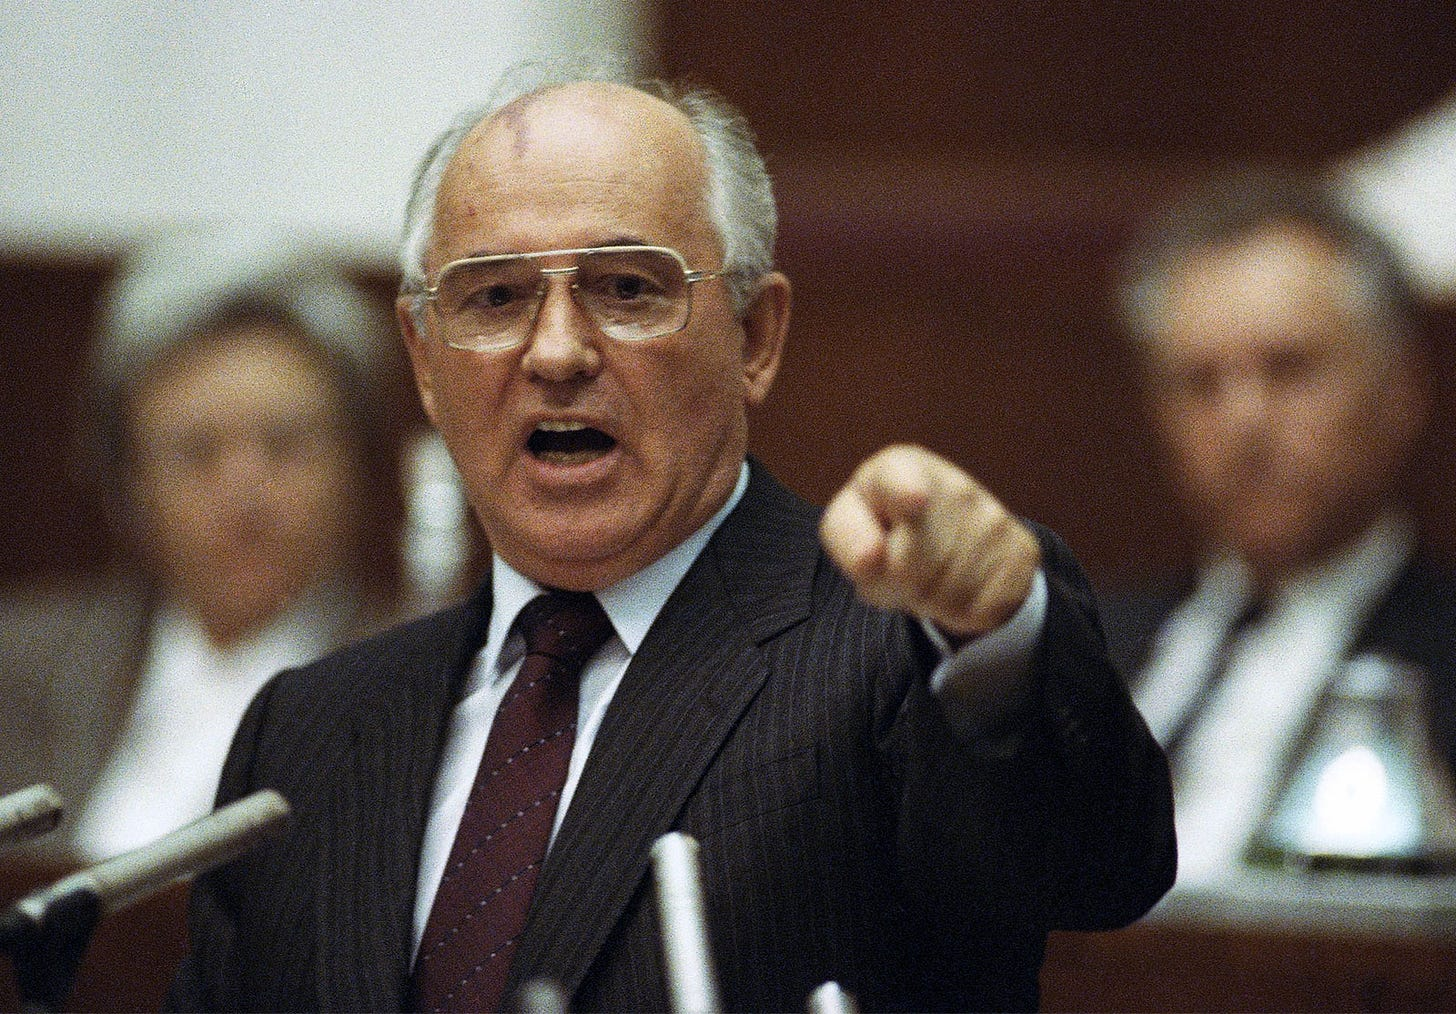 https://cdn.britannica.com/71/194471-050-06A60E75/Mikhail-Gorbachev-1991.jpg